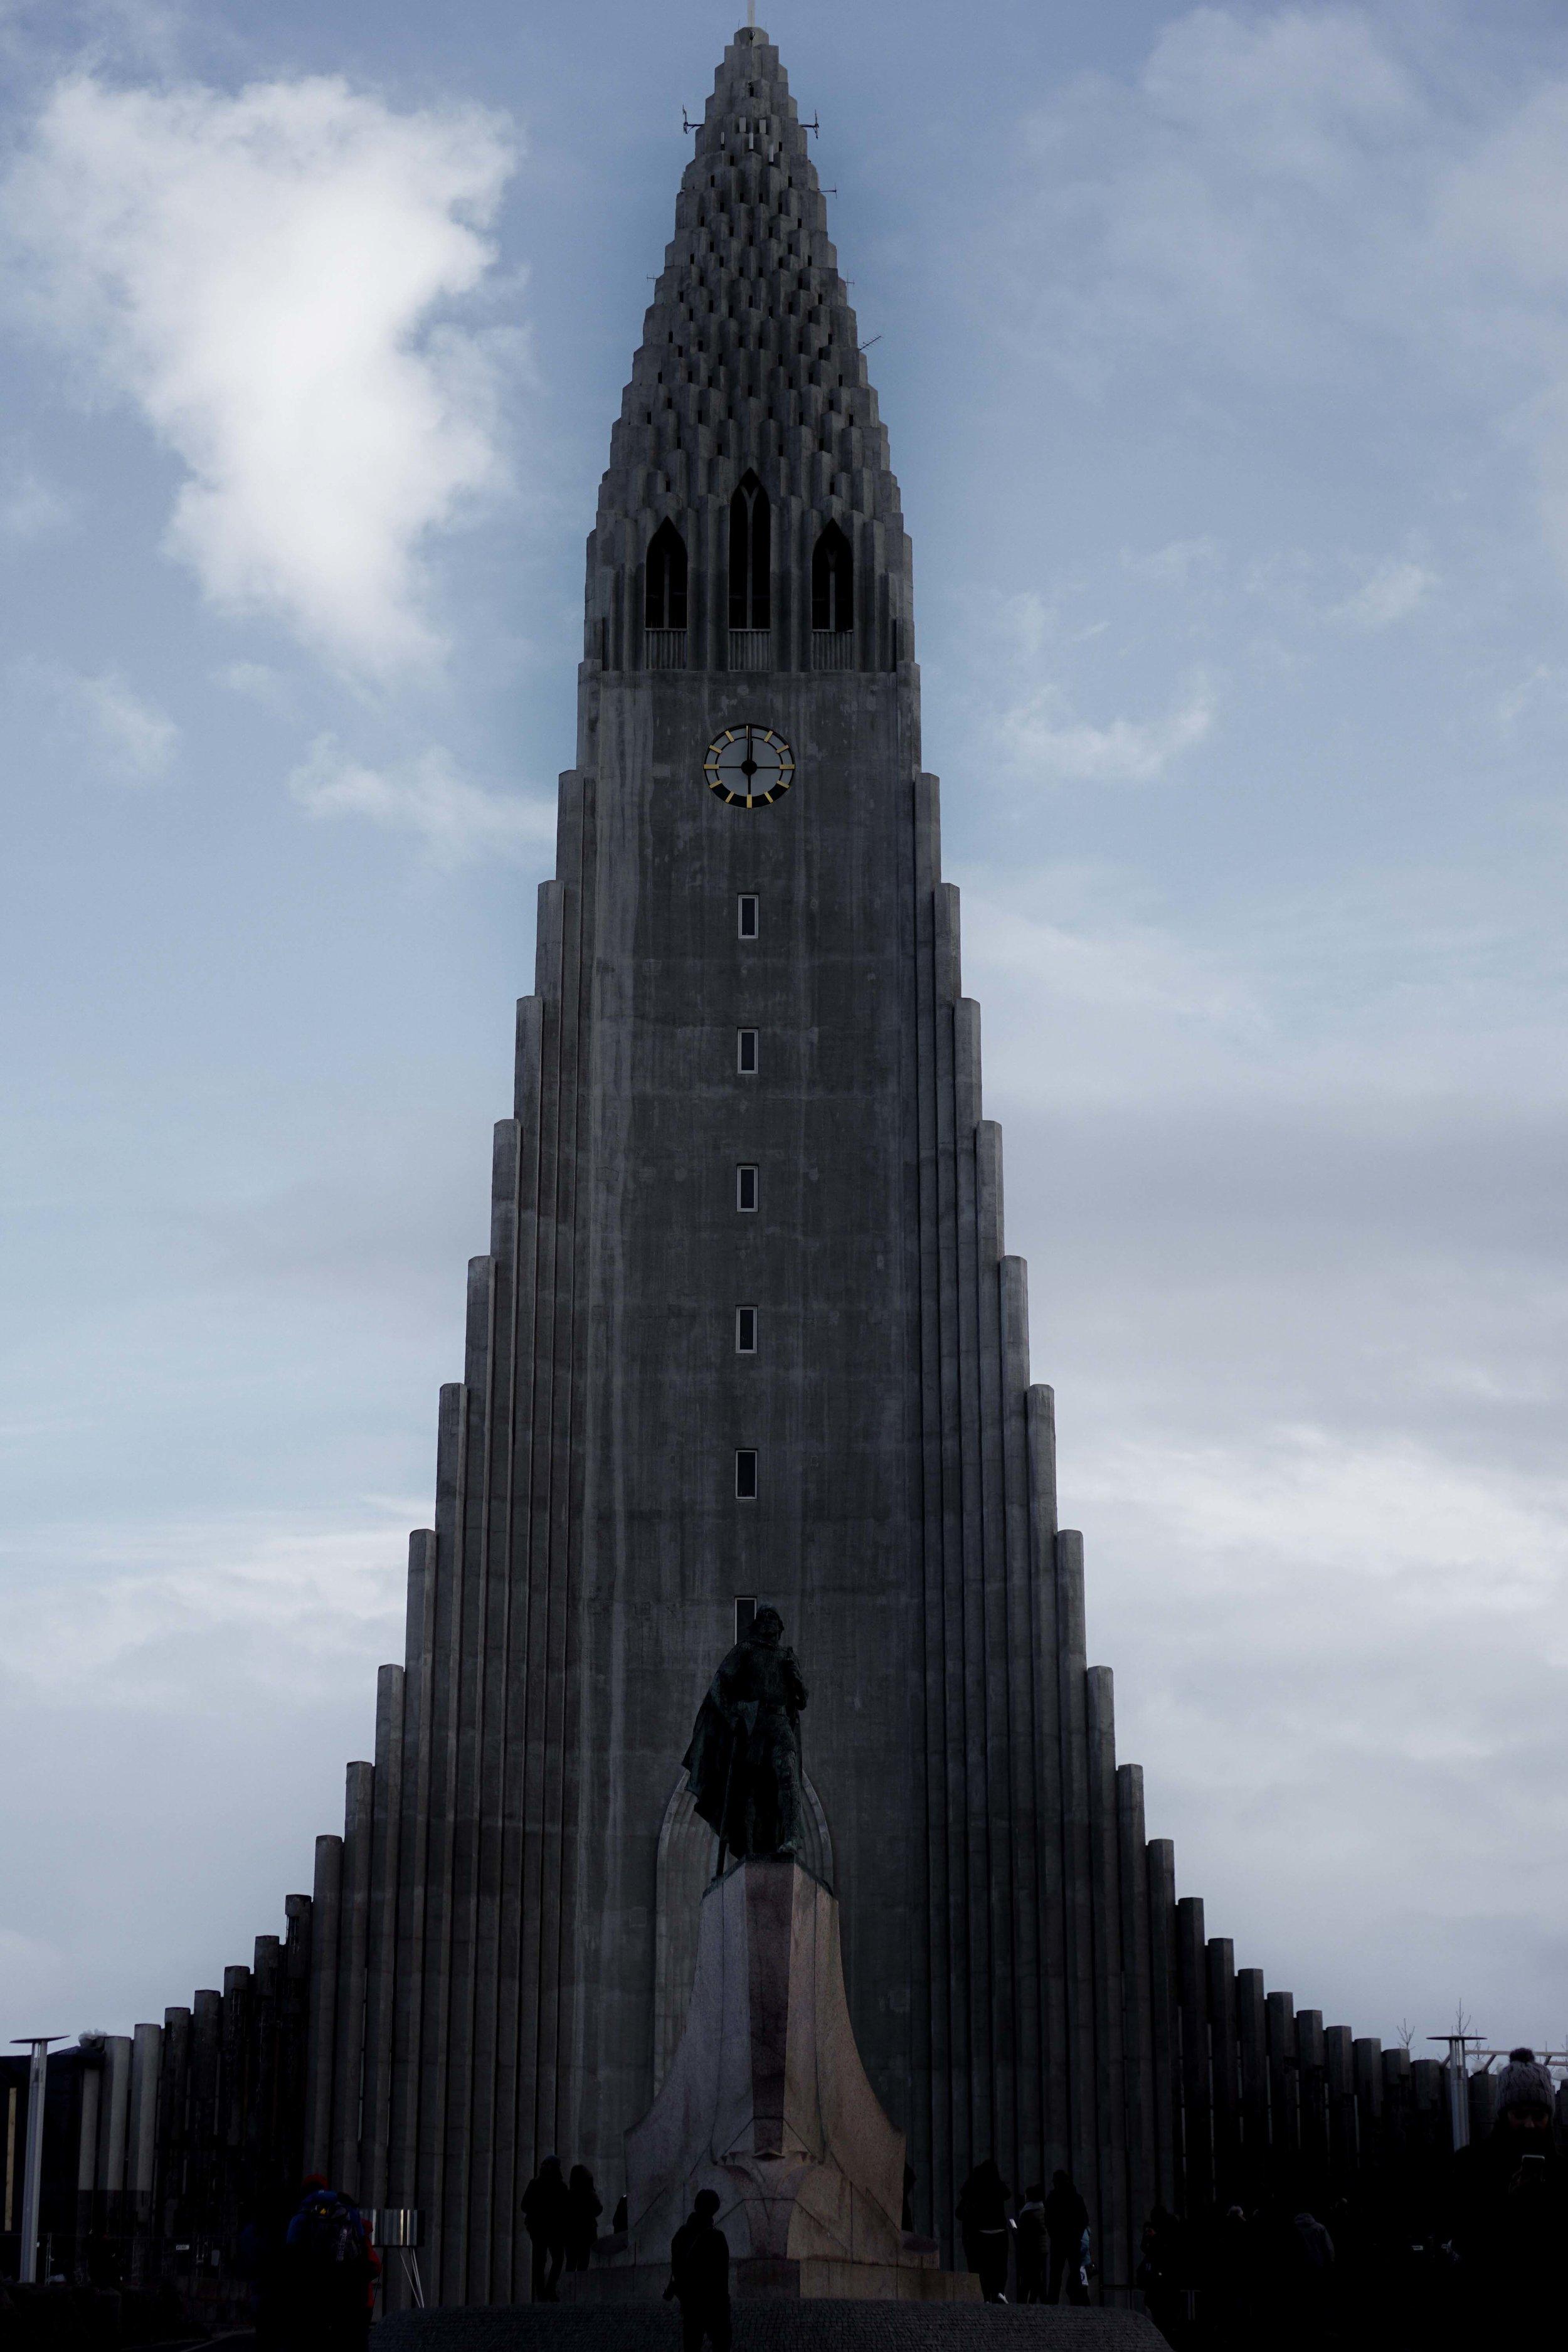 Hallgrímskirkja in the middle of Reykjavik.